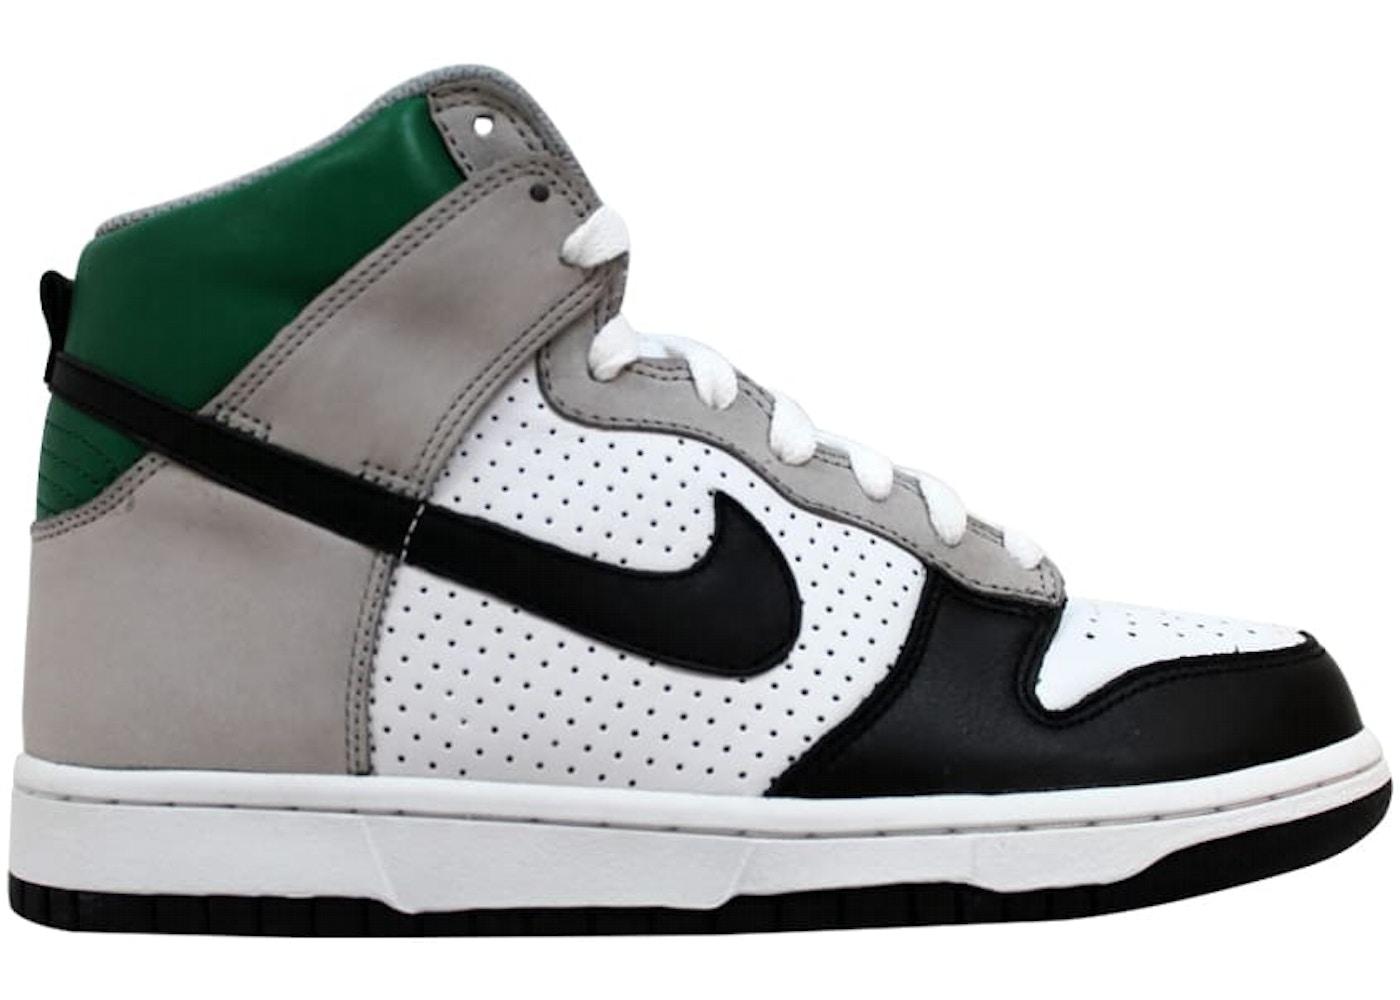 buy popular 9c58f 82f44 Nike Dunk High Premium Bo Knows - 306968-002